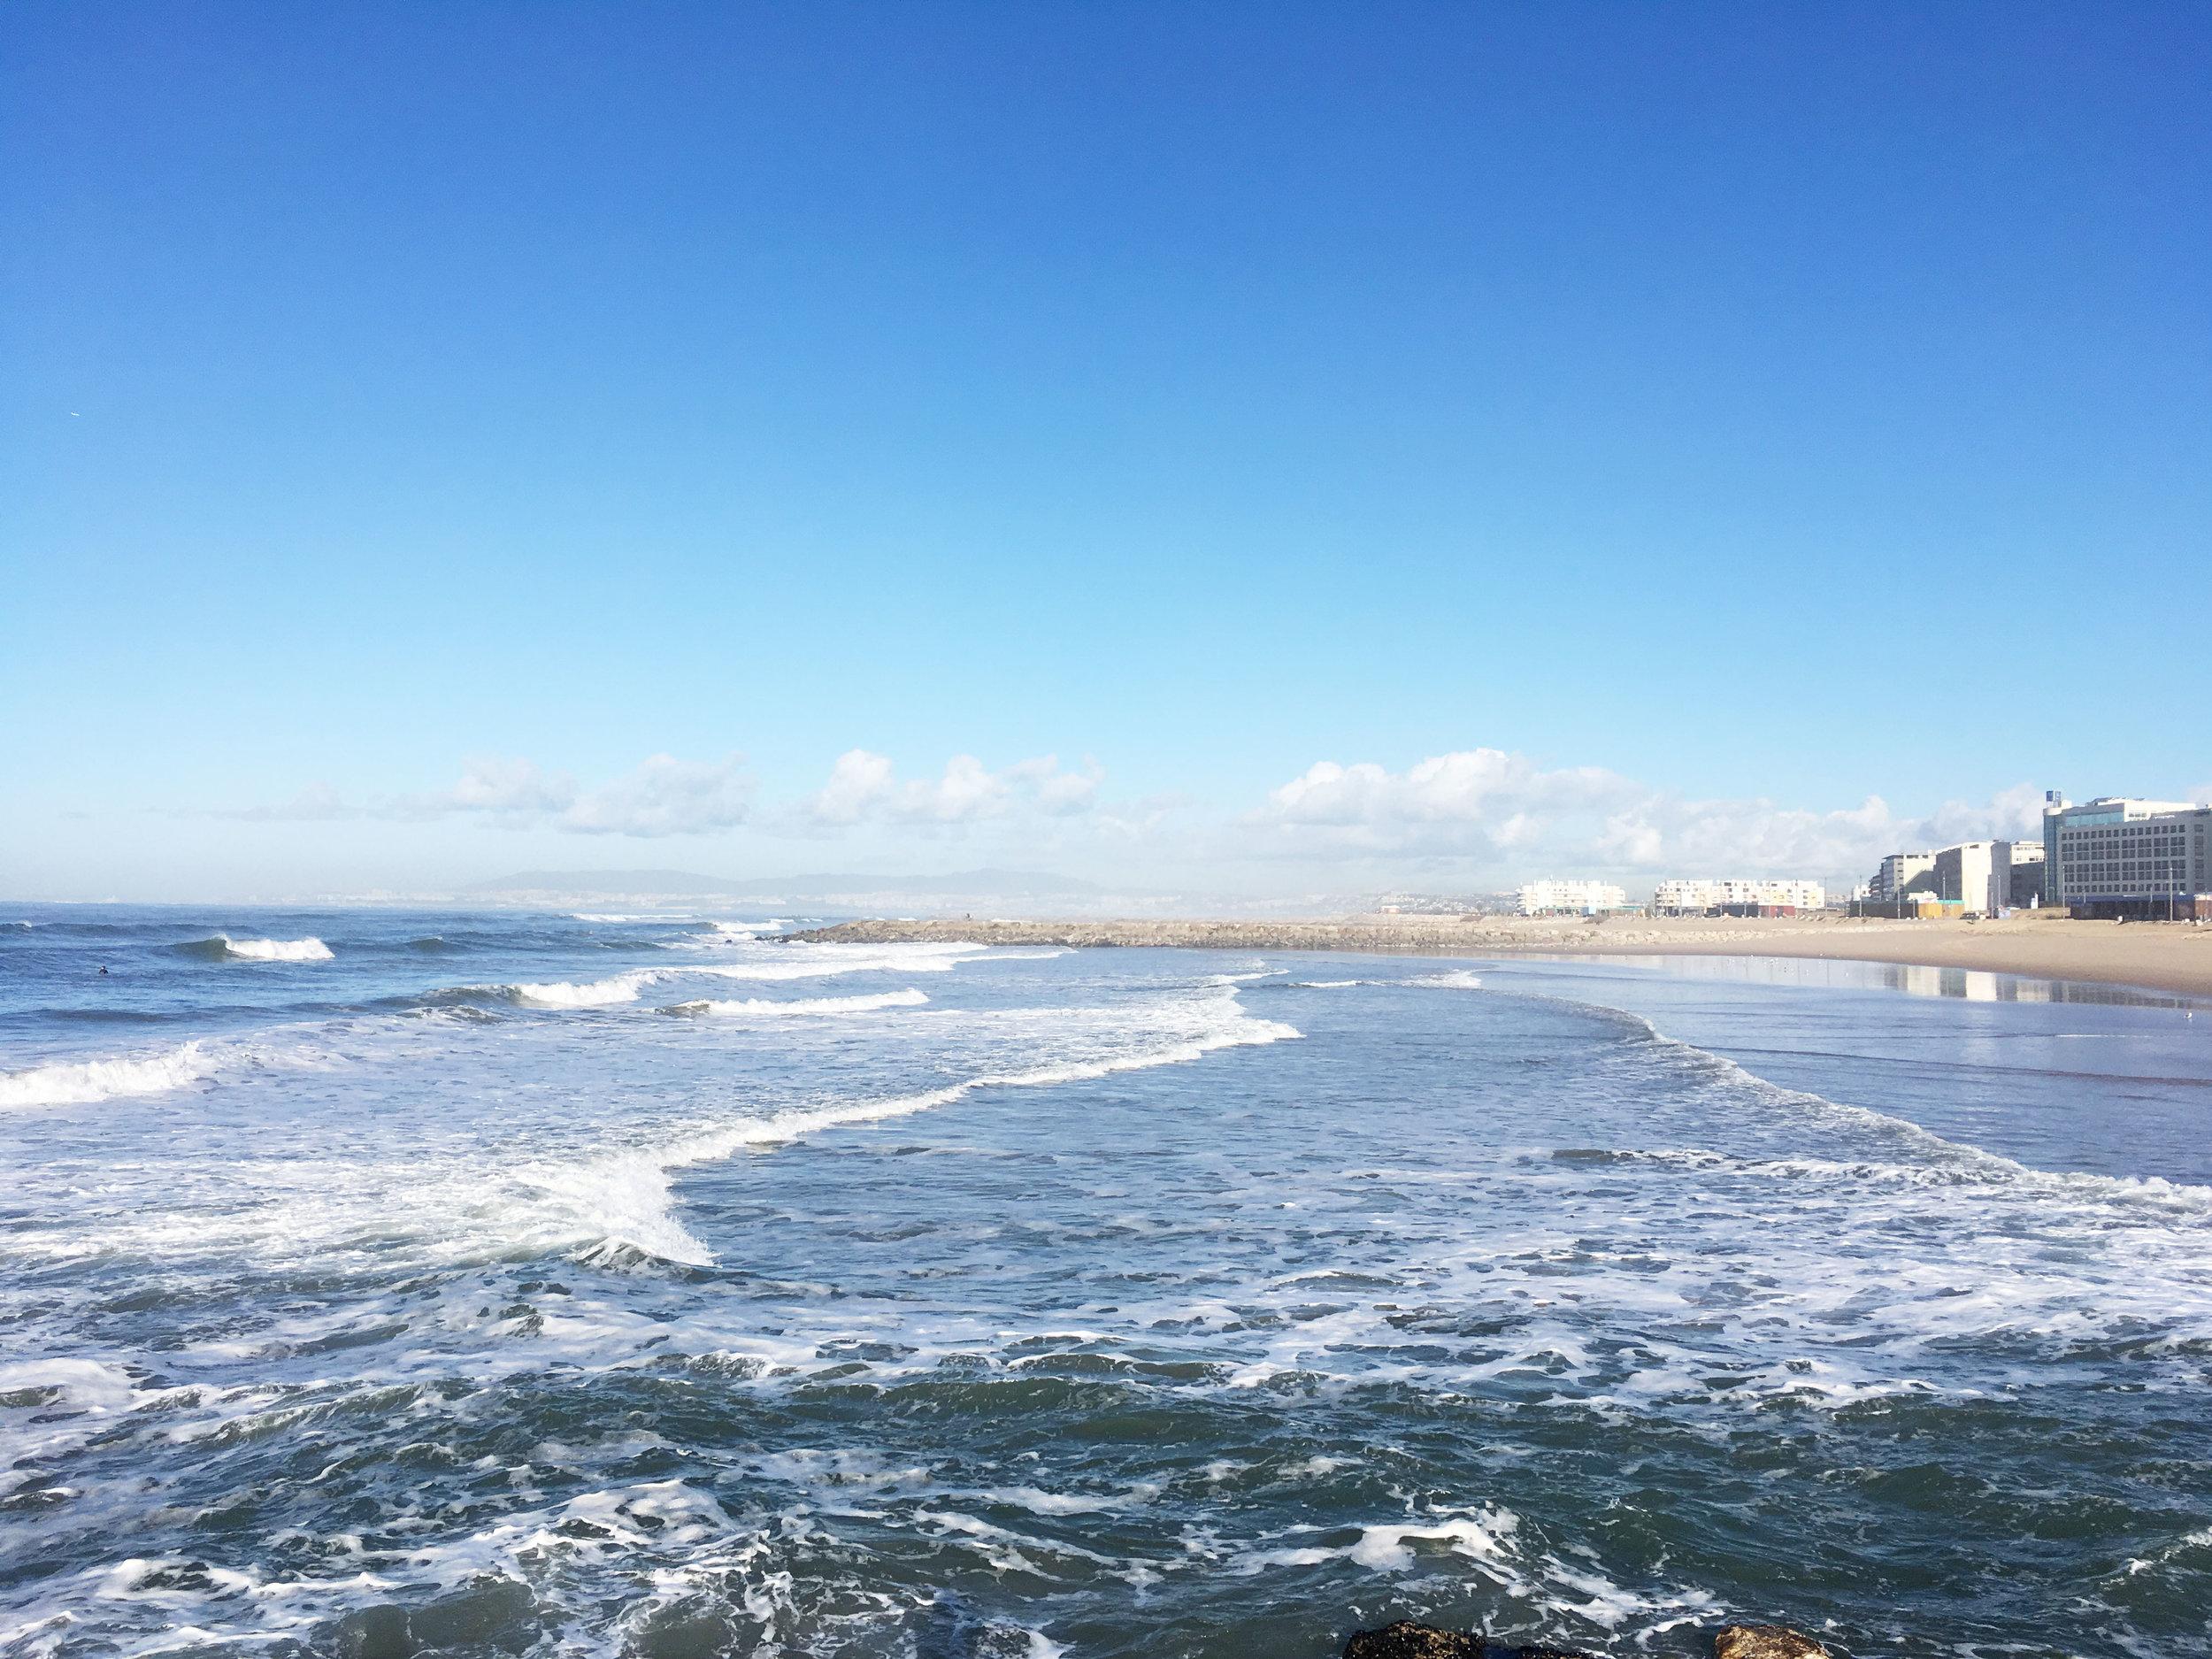 discover portugal - lisbon, costa da caparica